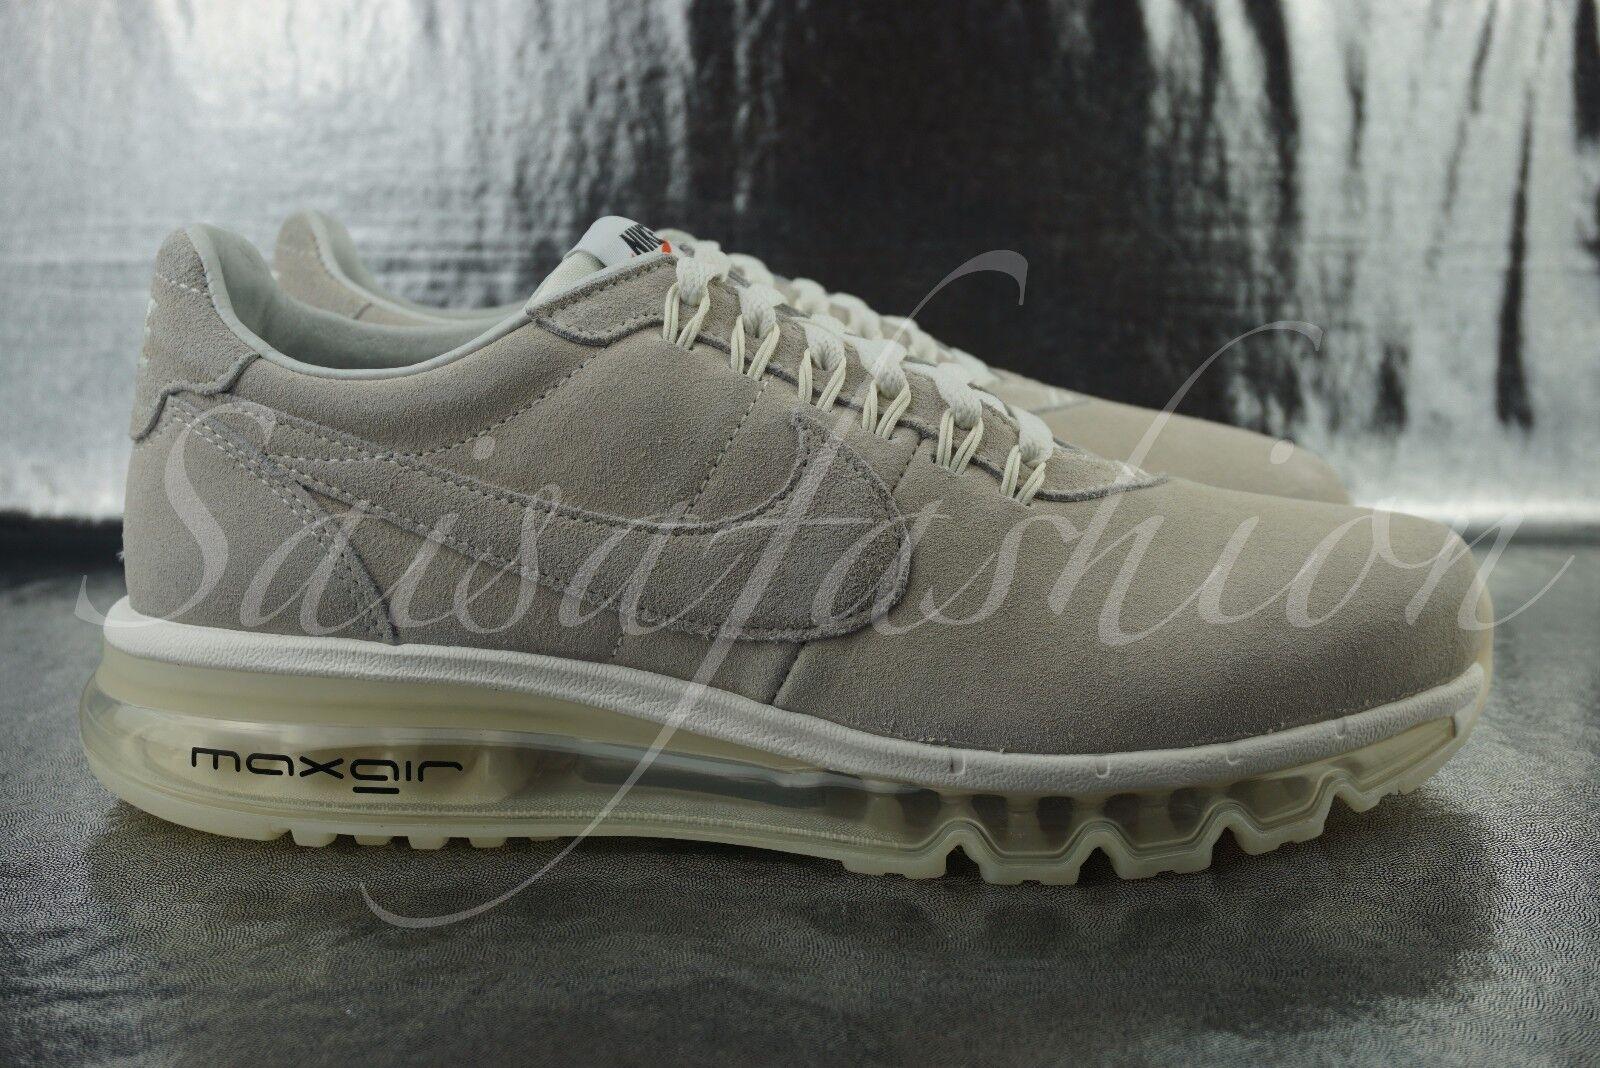 Nike air max ld-zero 848624-100 frammento hiroshi fujiwara vela ds sz 10